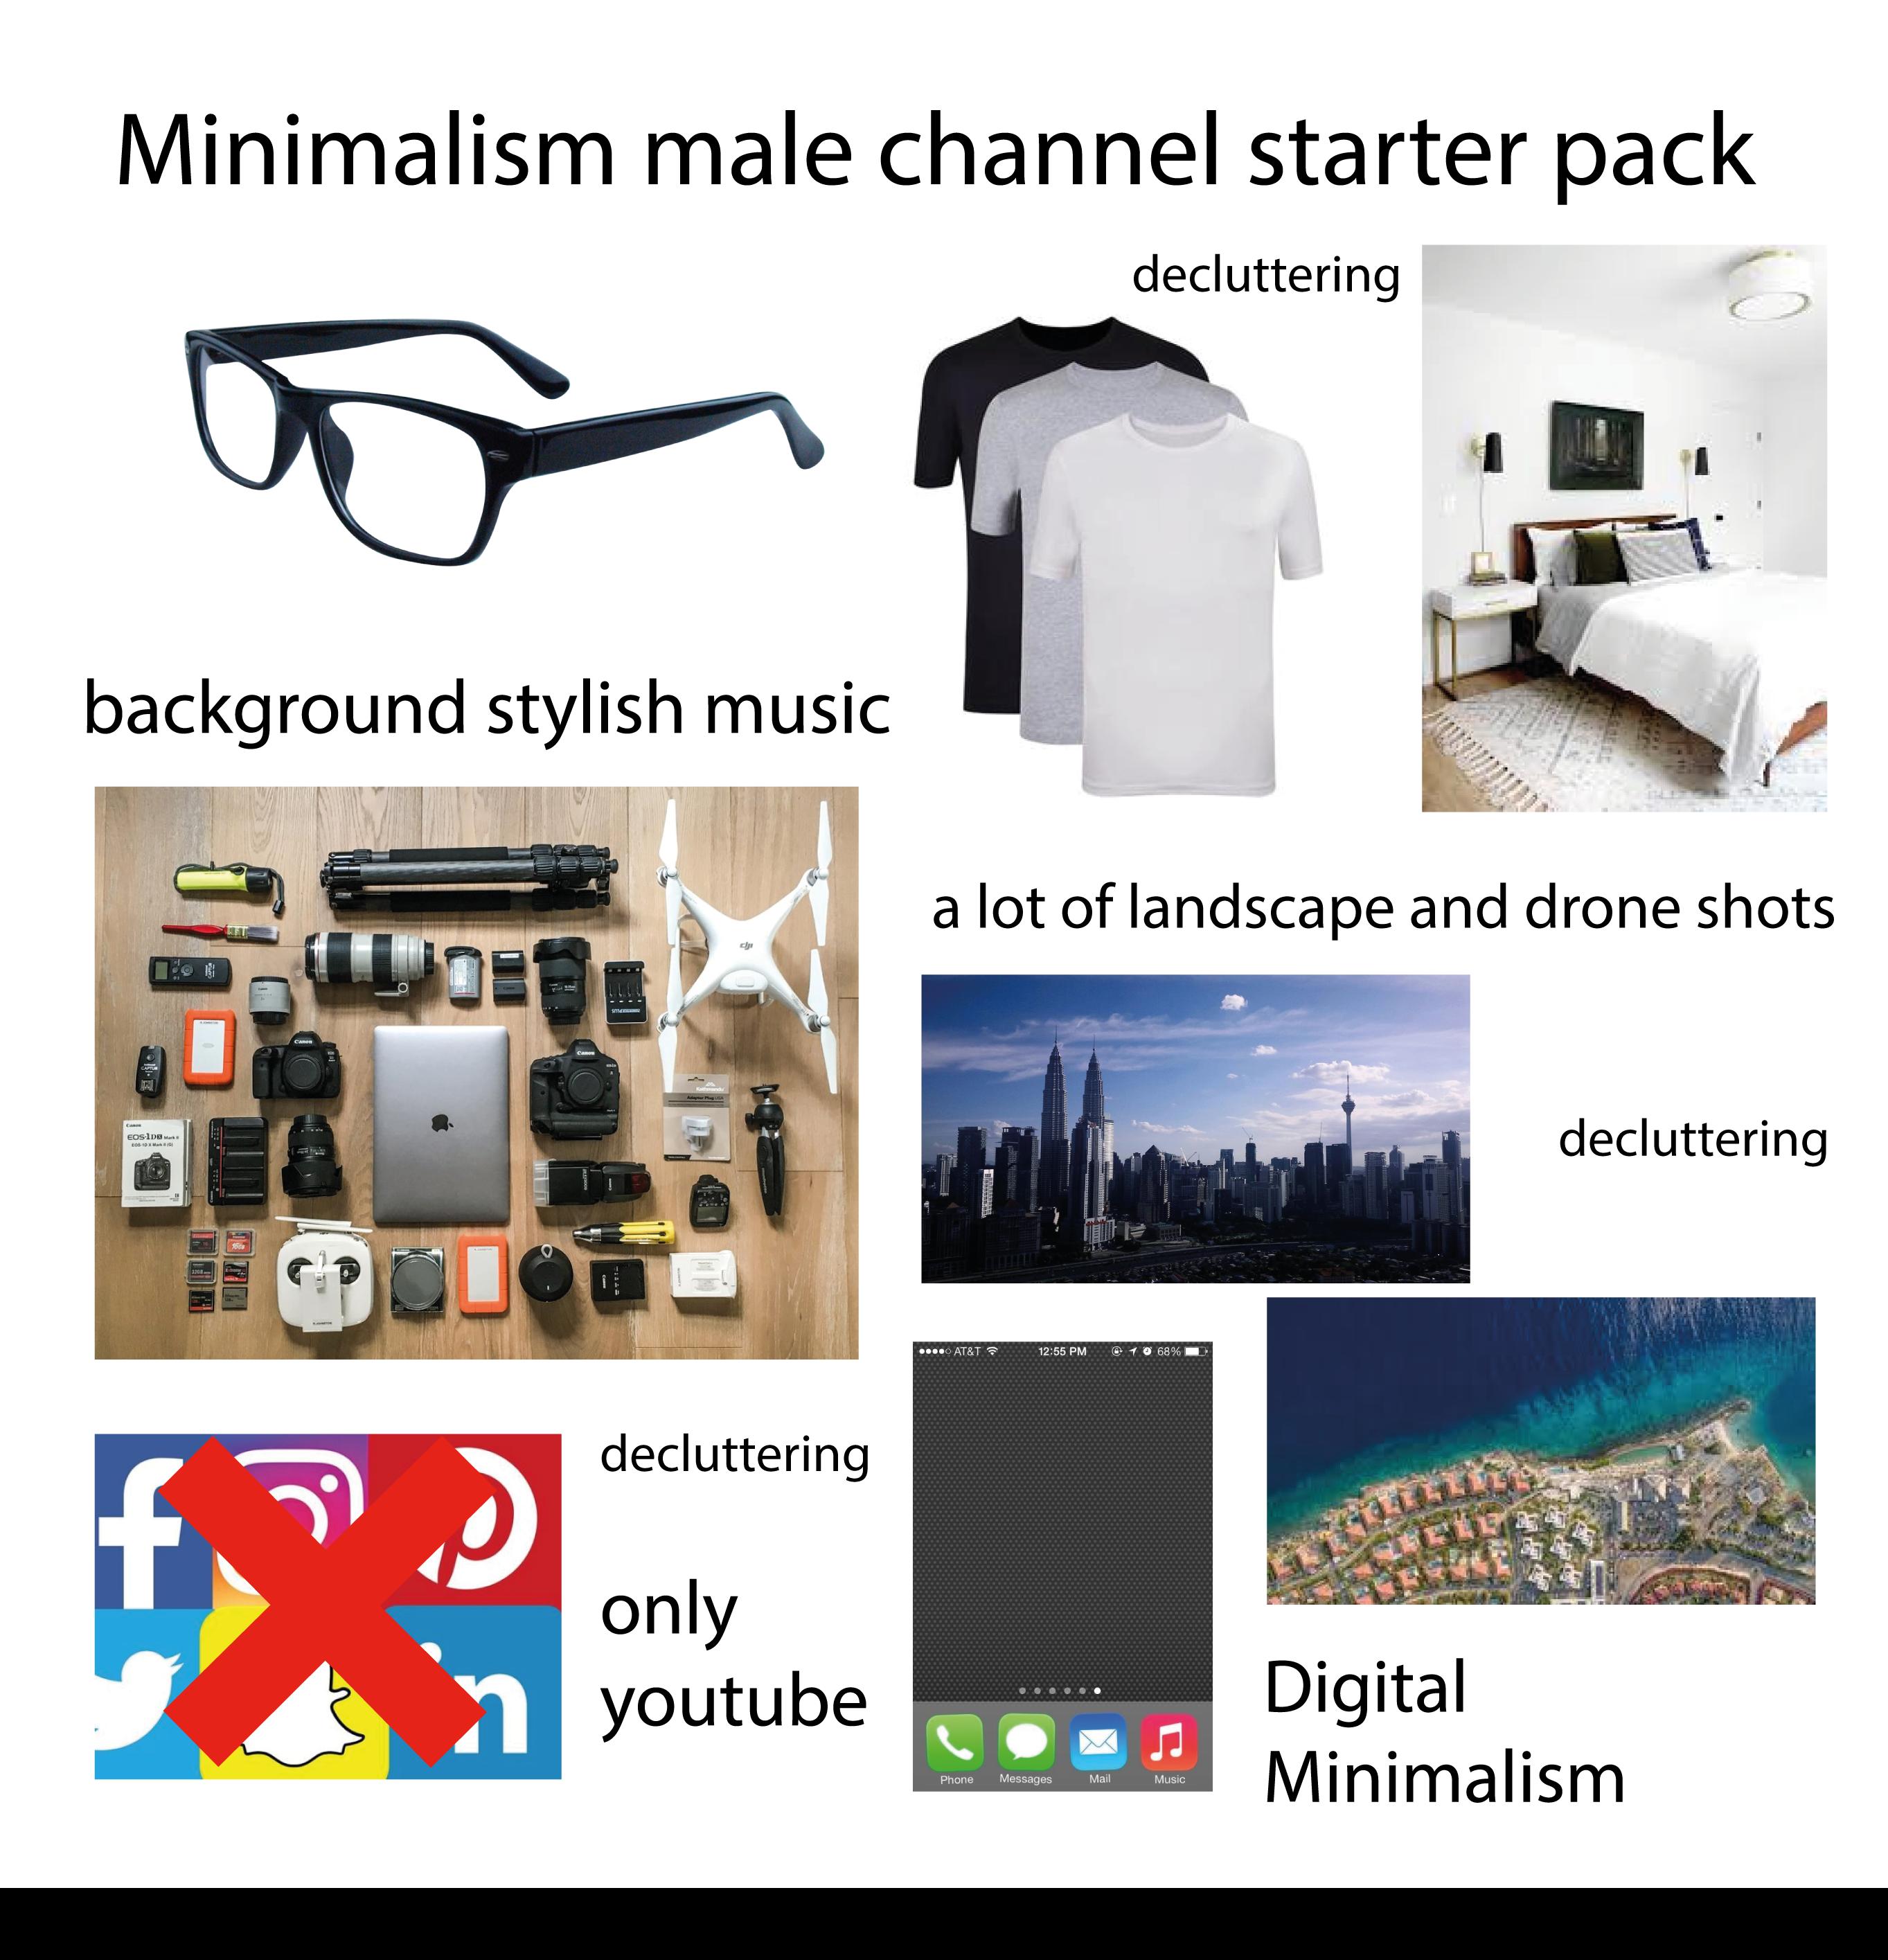 Minimalism male channel starter pack | r/starterpacks | Starter Packs |  Know Your Meme